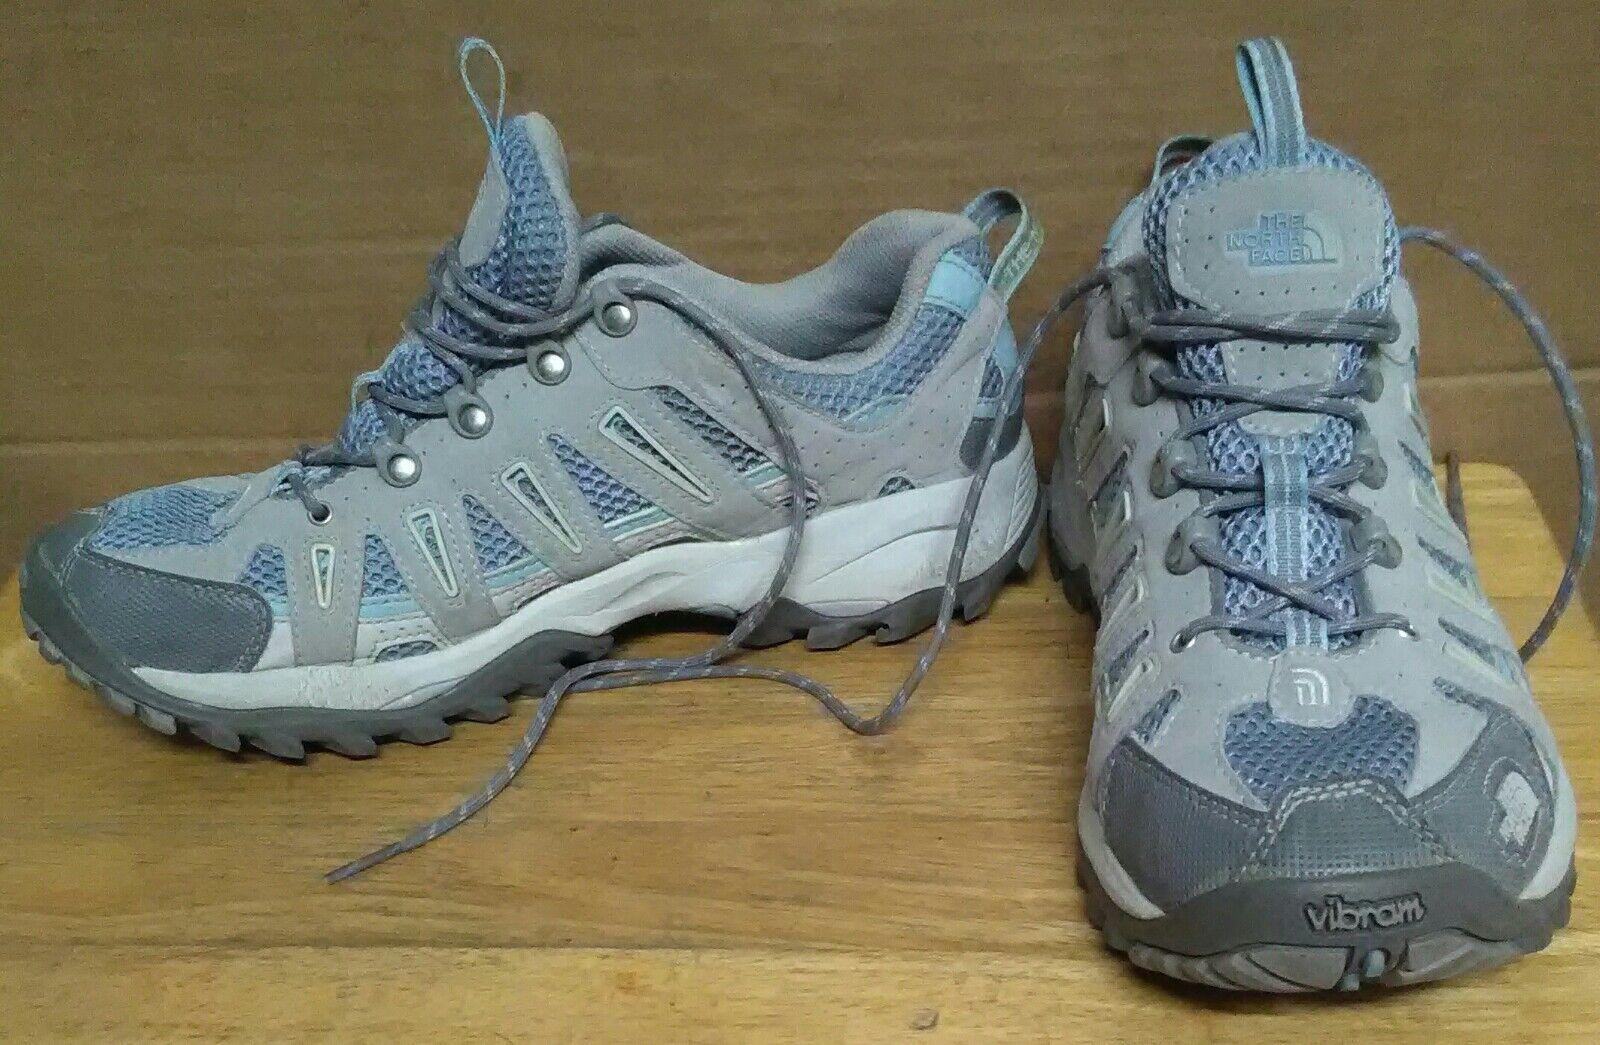 The North Face Women's Vibram Vibram Vibram Hiking Trail shoes Sneakers. Size 9.5 a78328